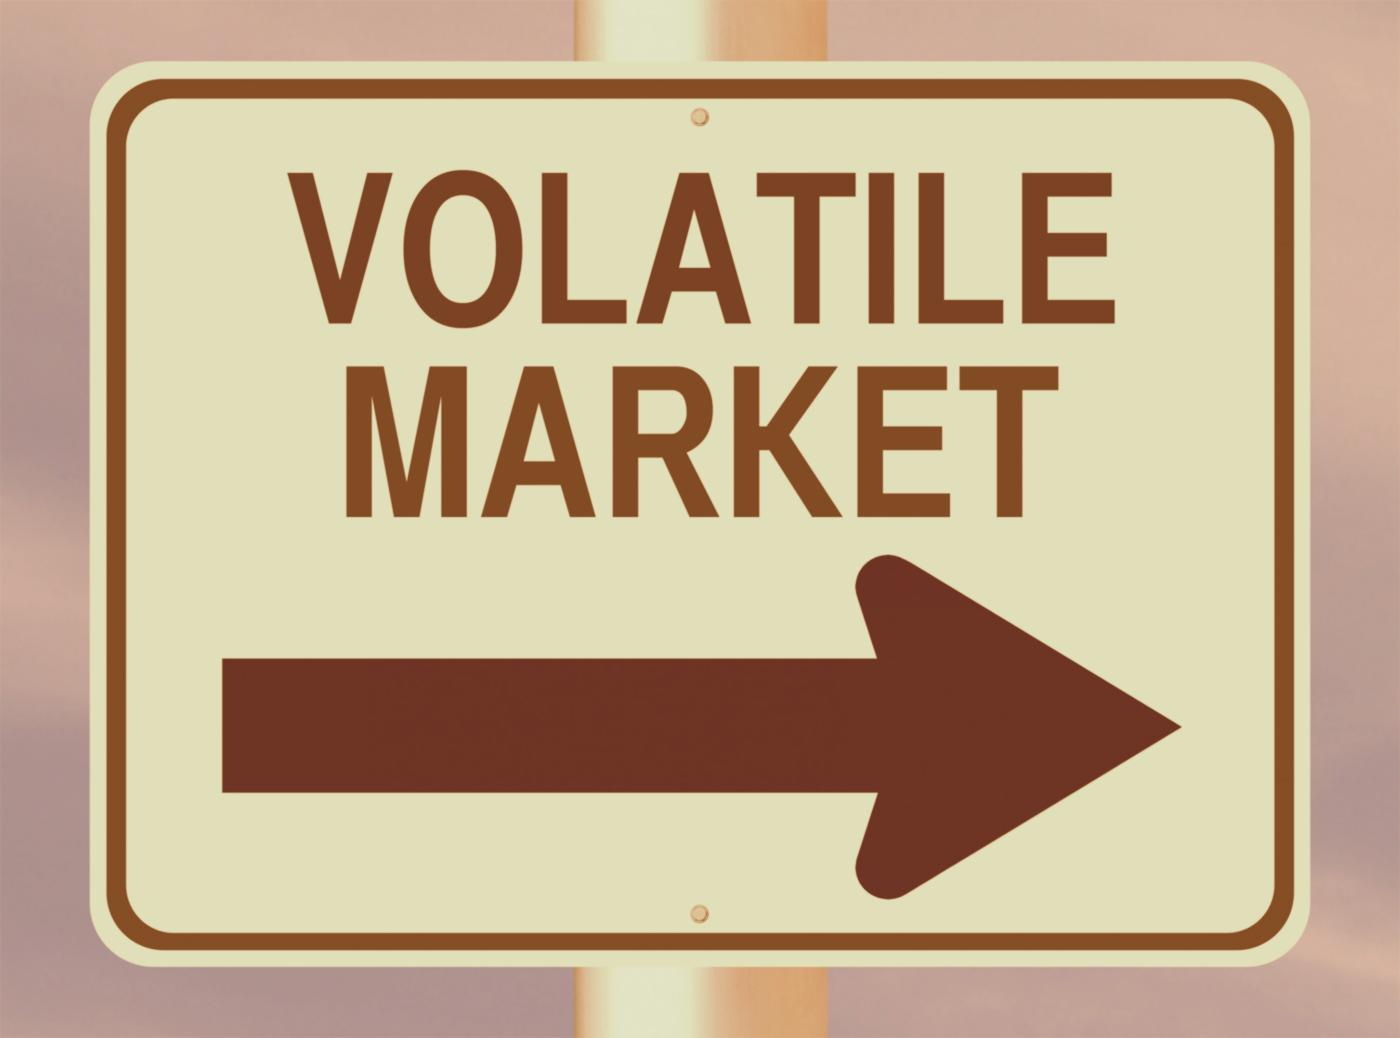 volatile-market-orangepeel